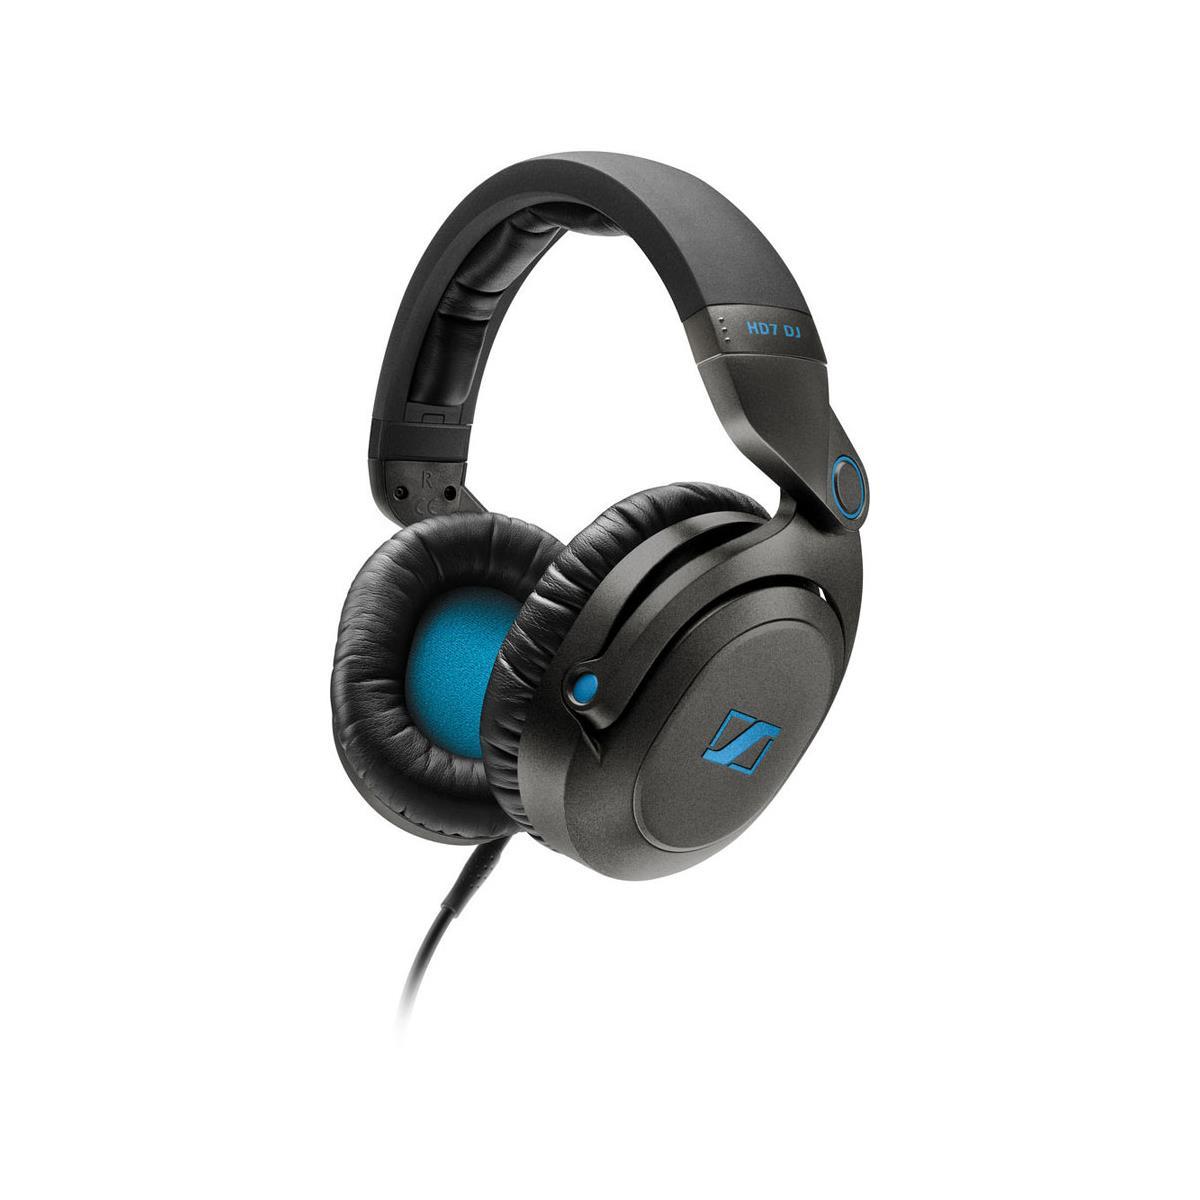 Sennheiser HD7 DJ Closed Pro Headphones $89.99 (After $15 MIR) + Free Shipping